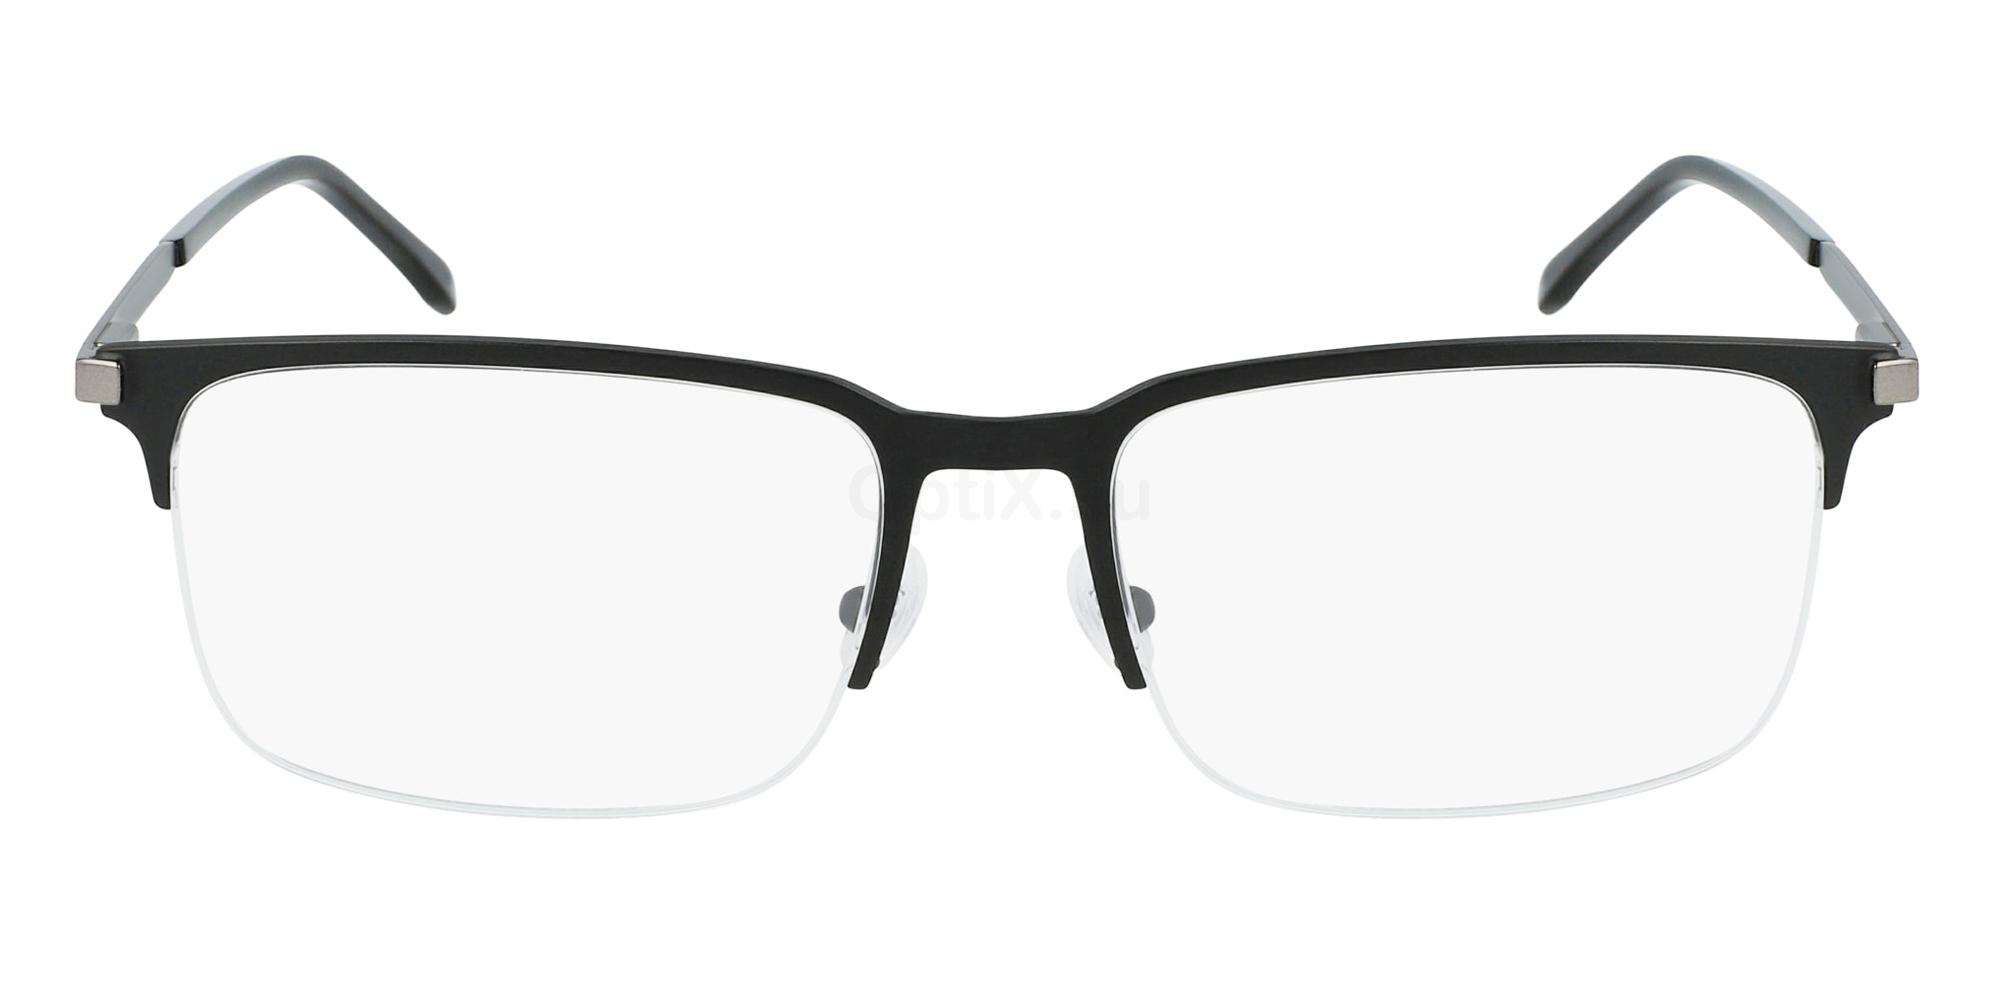 001 L2268 Glasses, Lacoste